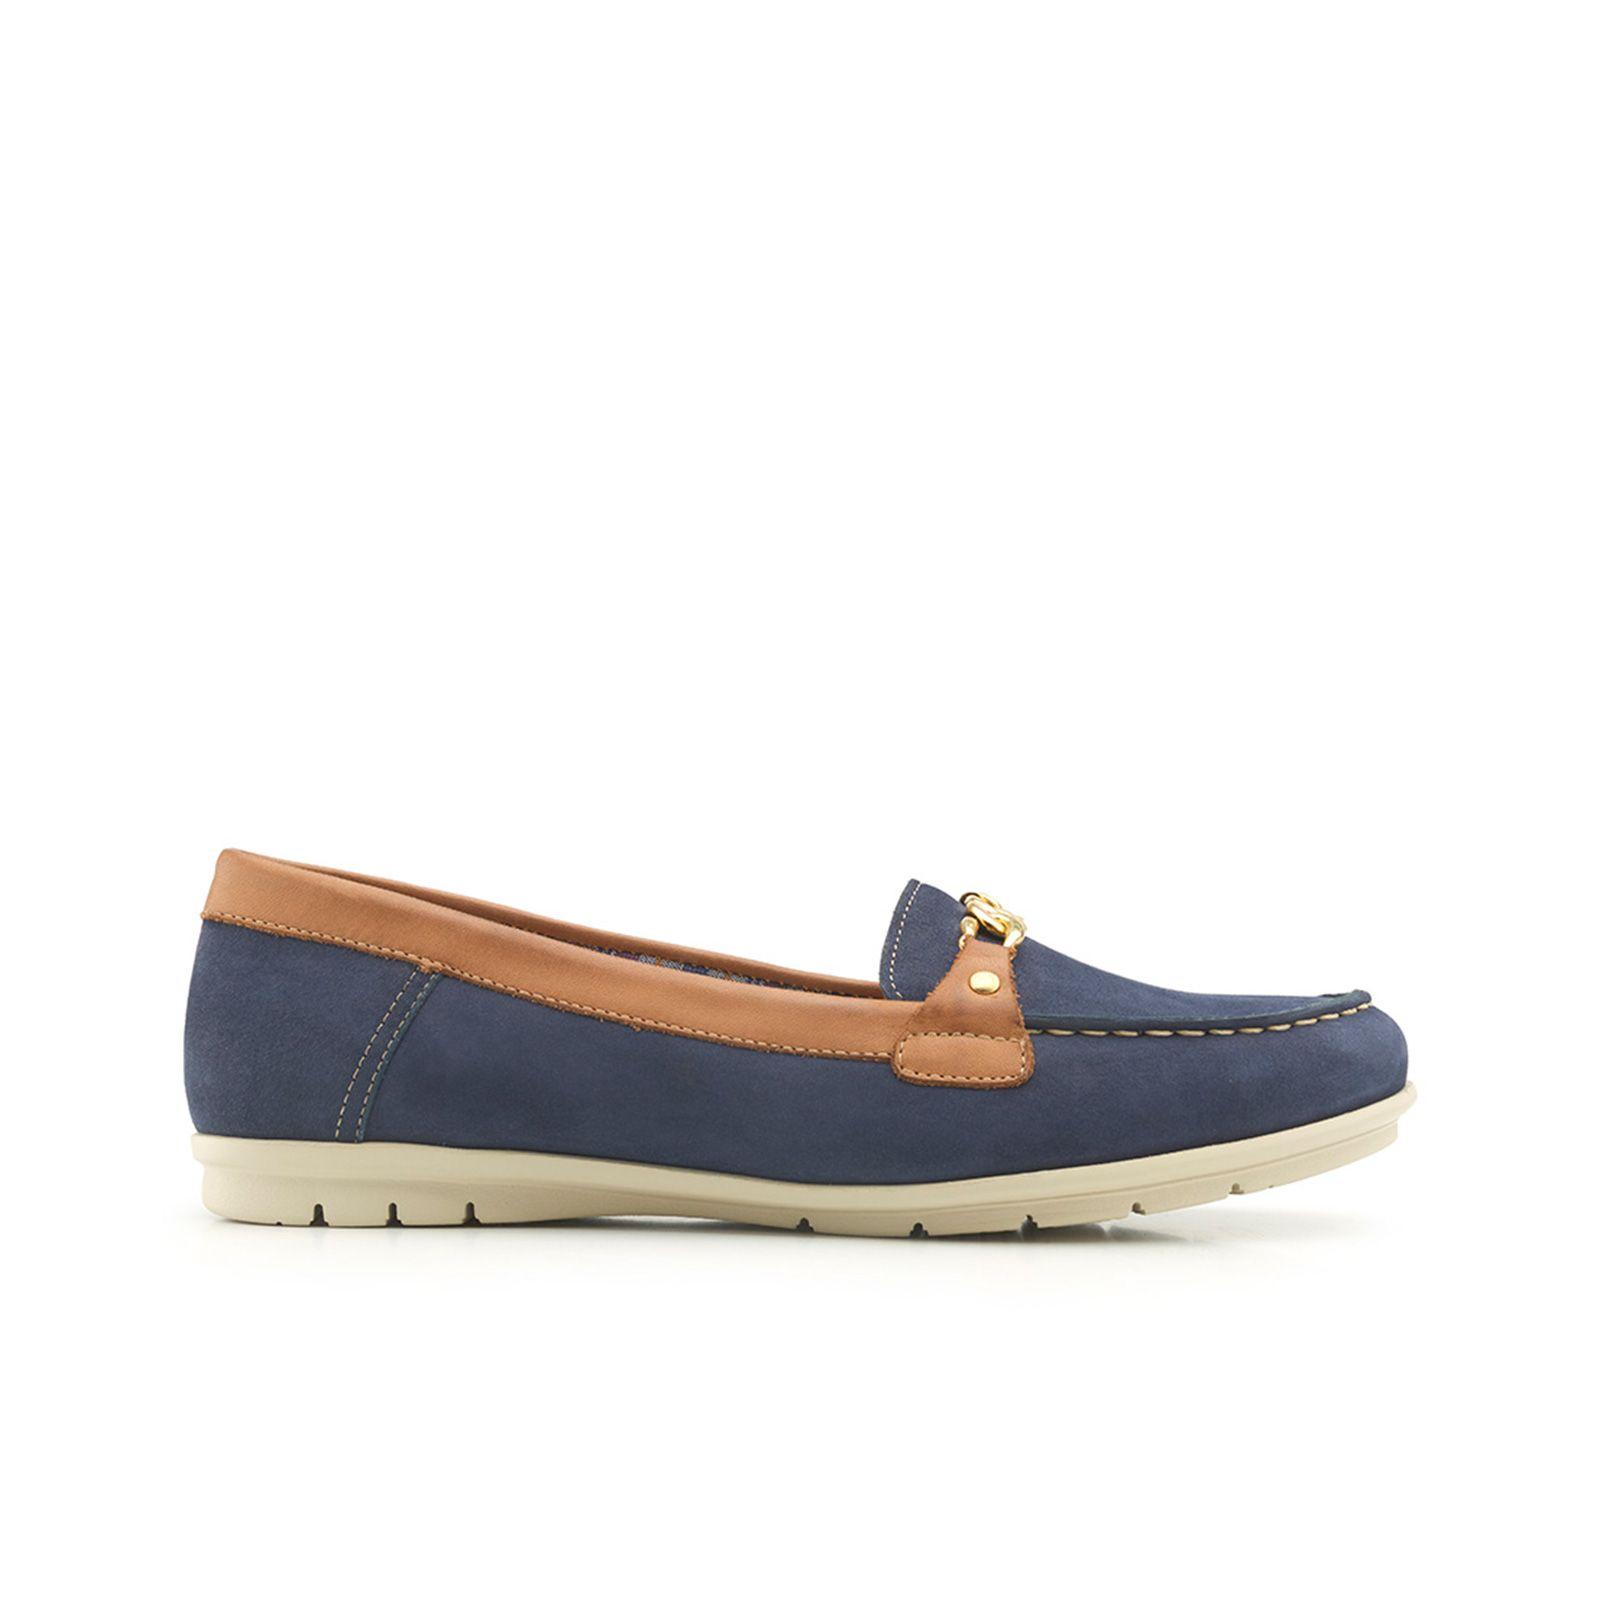 0837b3bcd6e Flexi - Calzado casual, sport y de vestir para dama | Favorite Shoes ...